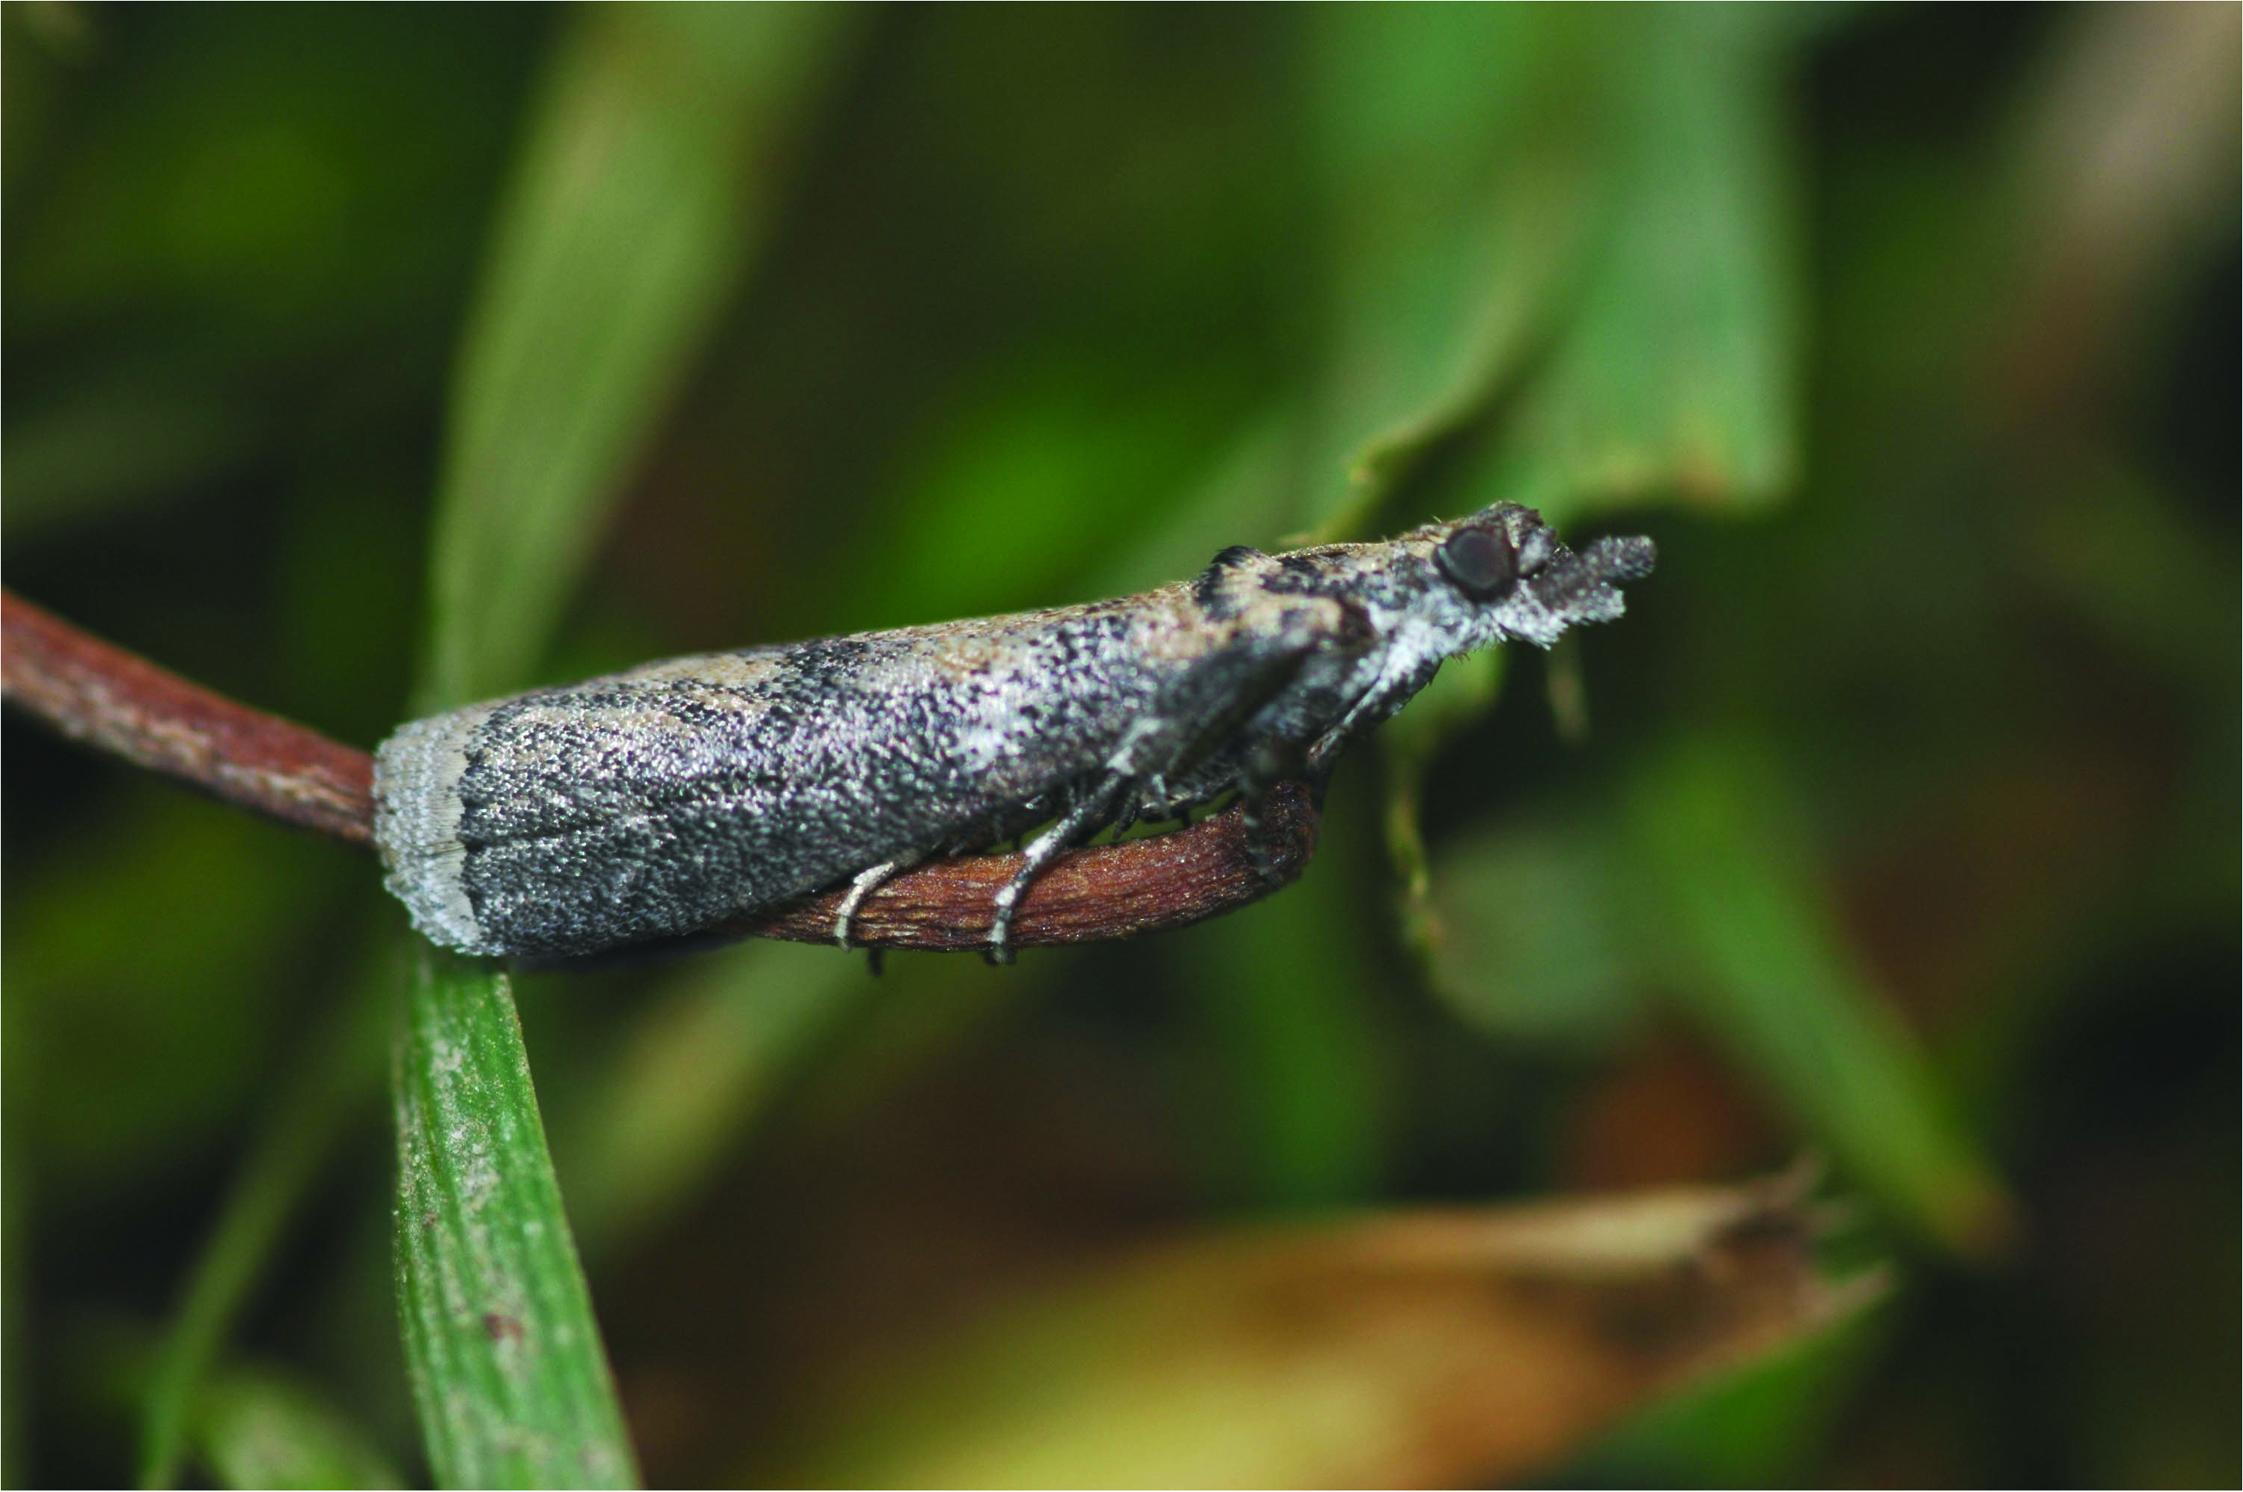 Concern for Navel Orangeworm Mating Disruption